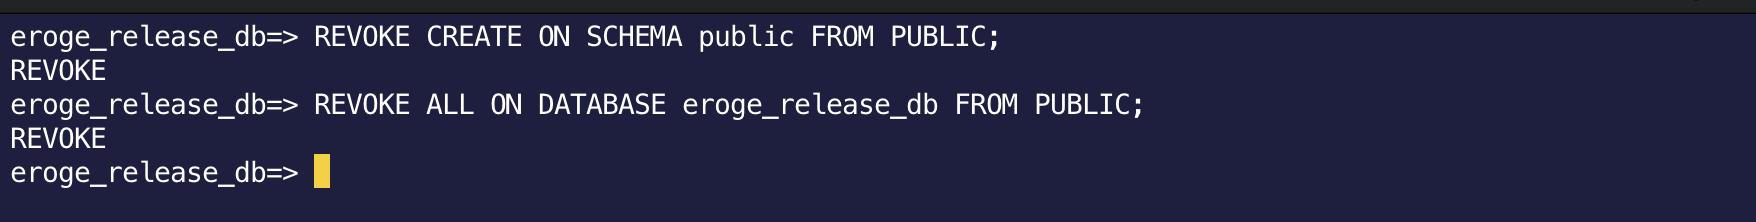 41_revoke_public_schema